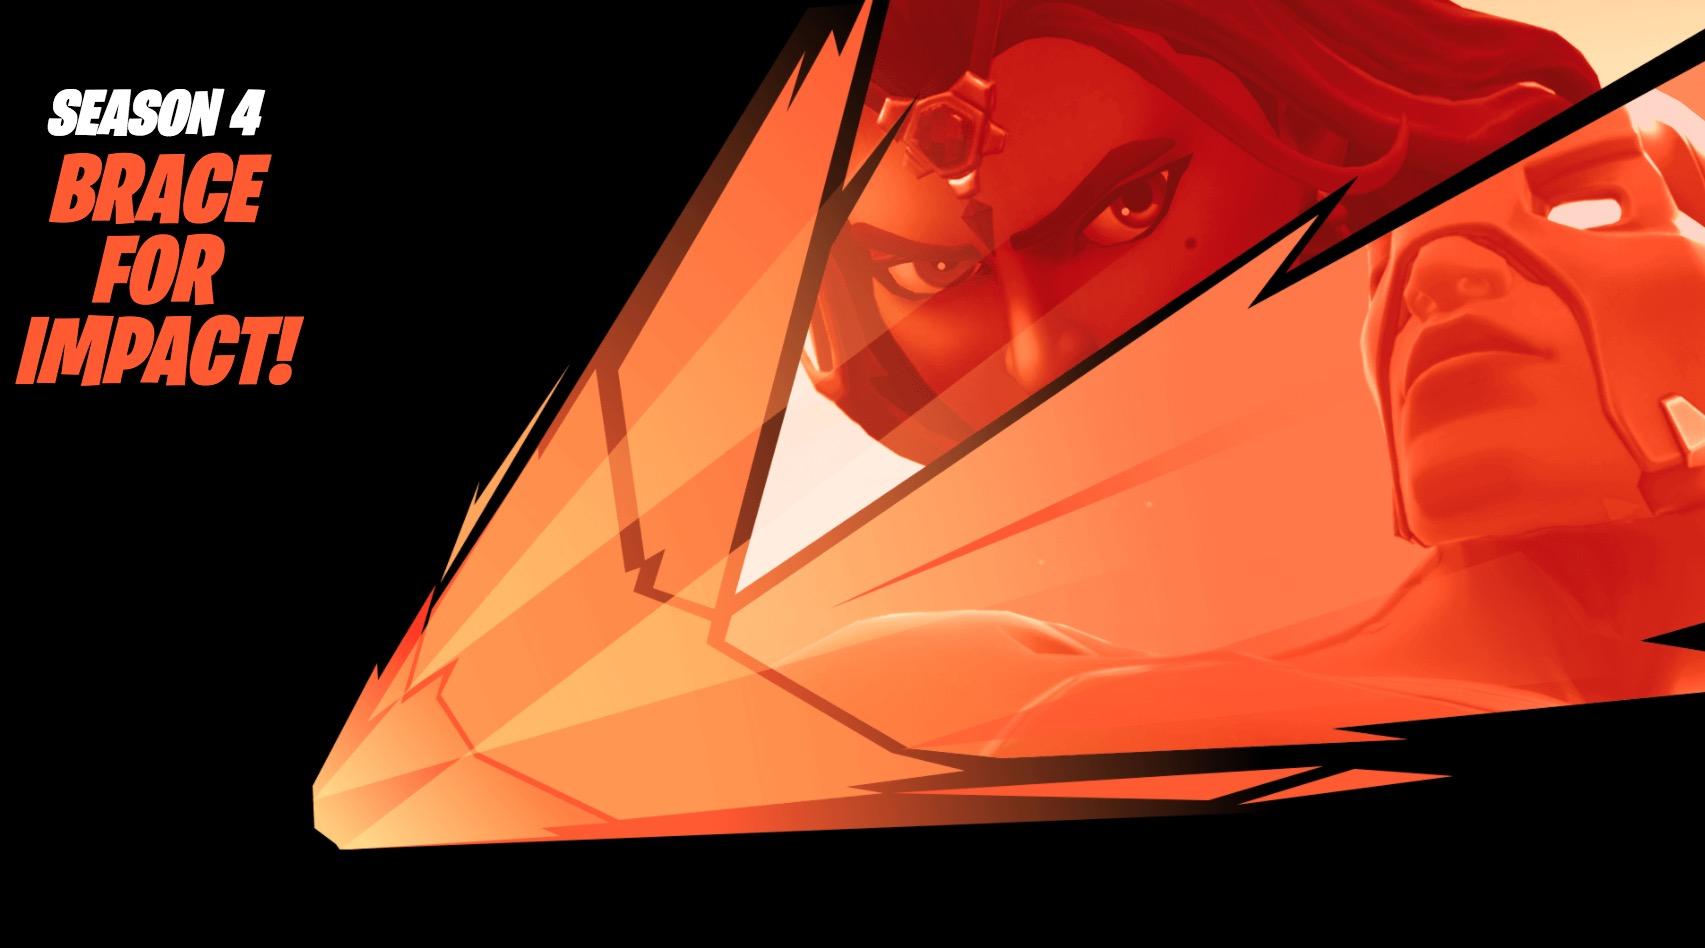 Prepare for impact as the new Fortnite Season 4 theme takes shape.